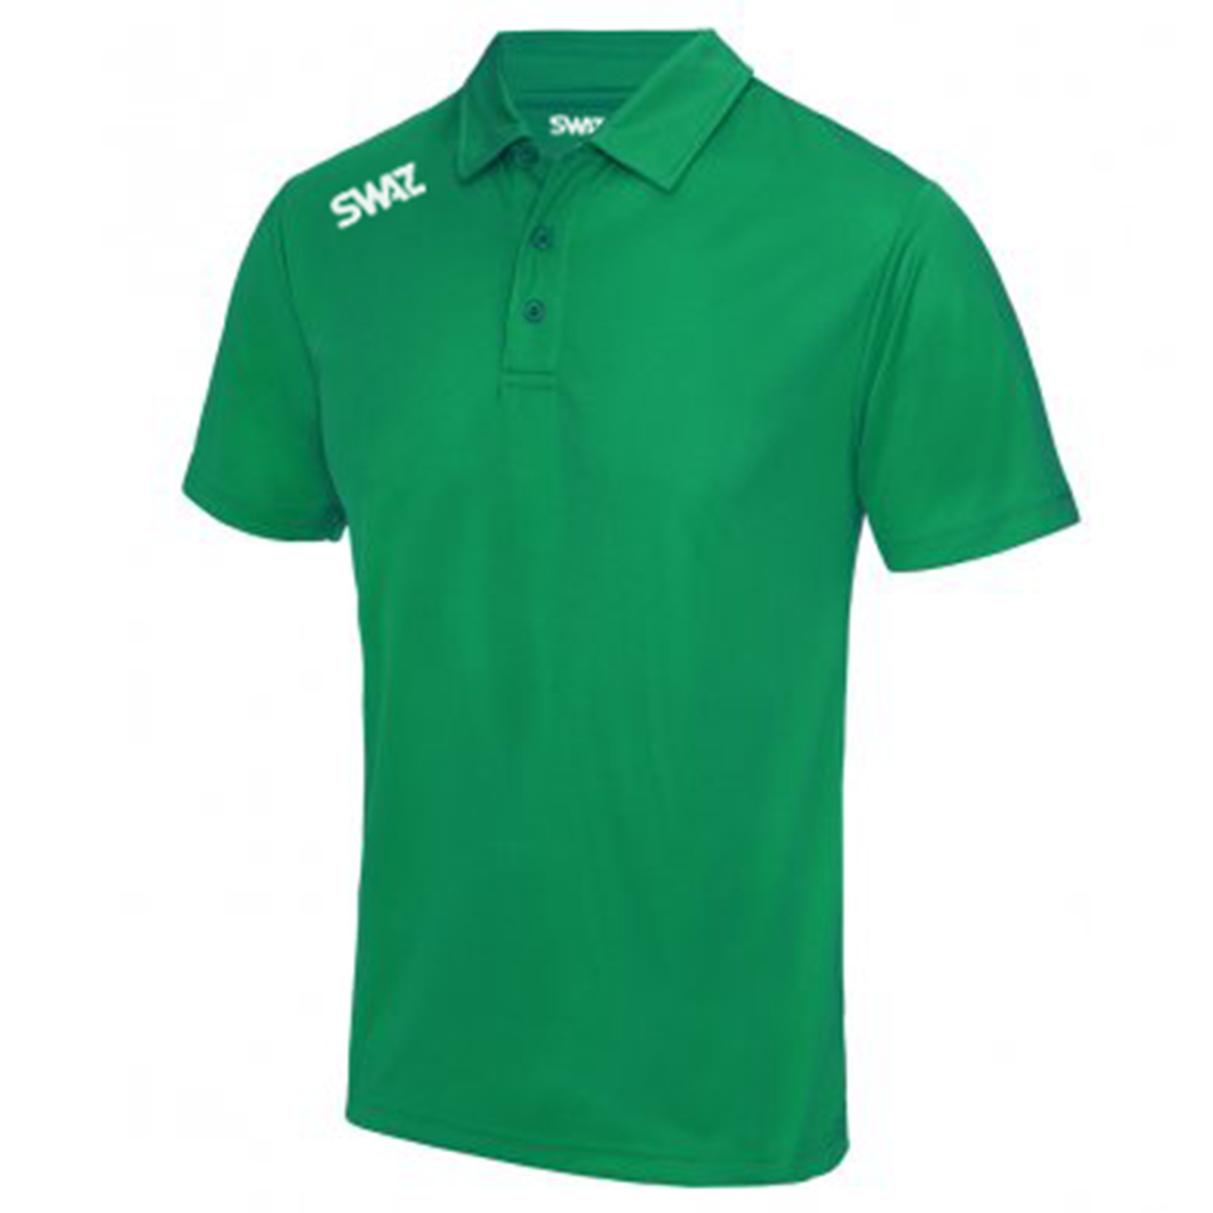 SWAZ Youth Club Polo – Green